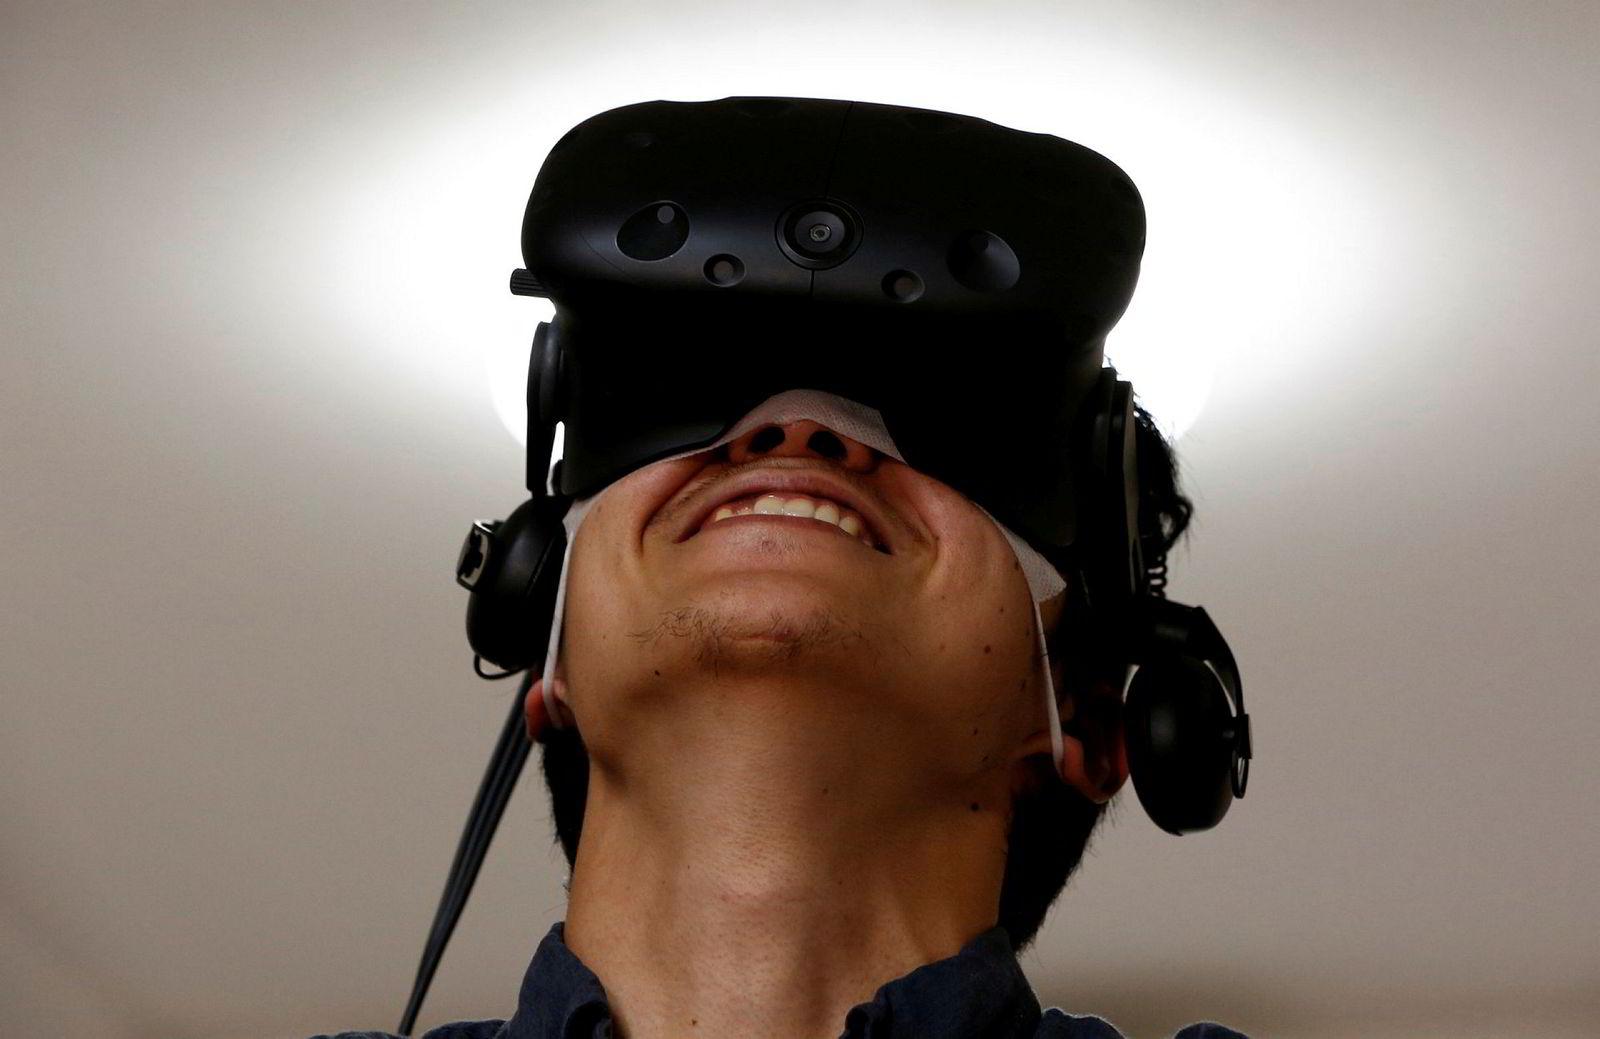 VR stenger ute alle syns- og hørselsinntrykk og vil erstatte omgivelsene med digitale omgivelser.